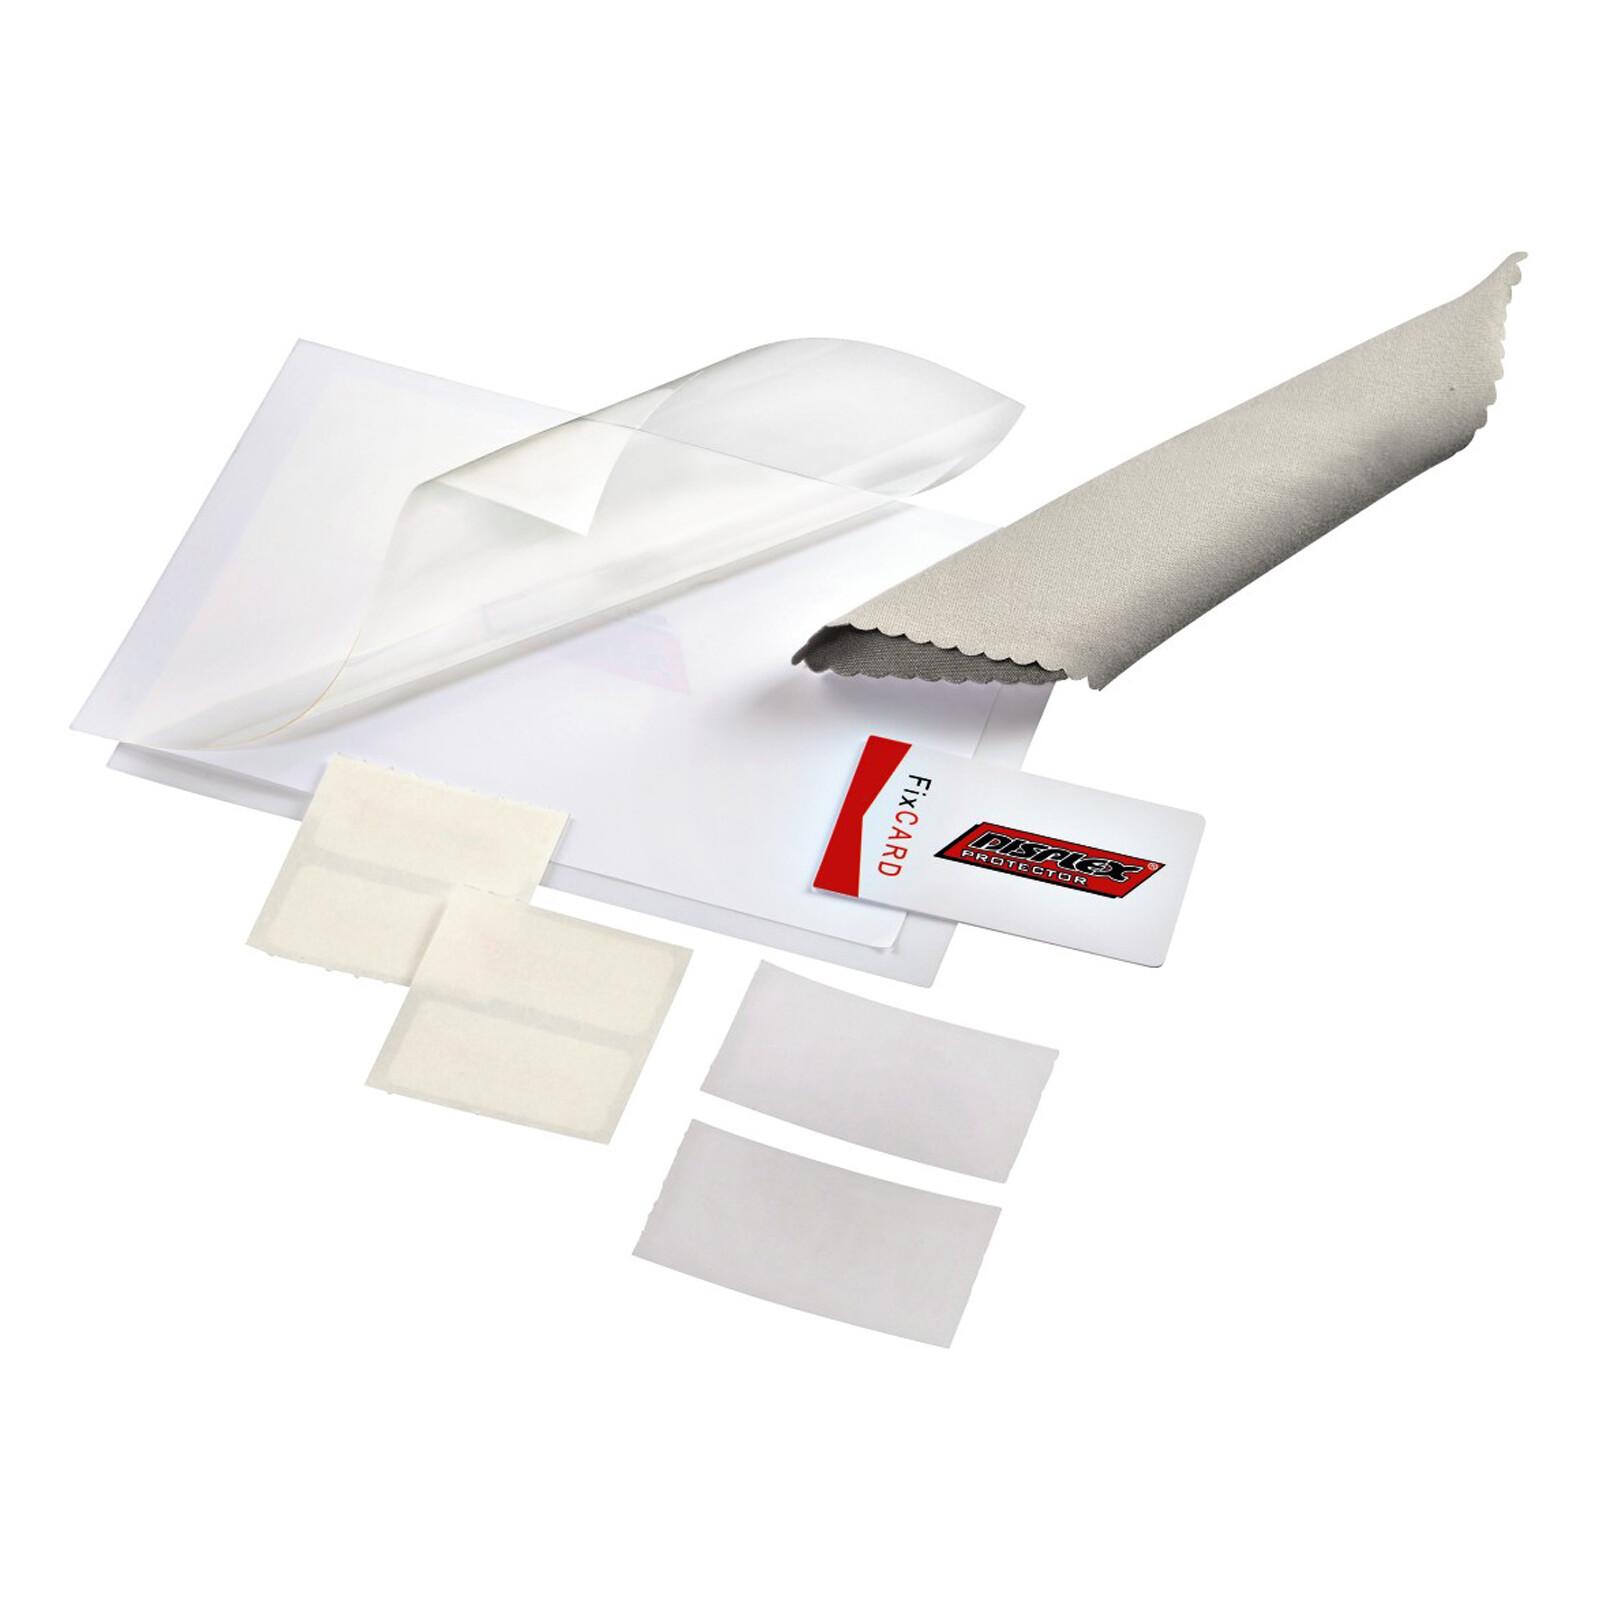 Hama 1210 Displayschutz Easy-on Premium bis 14 cm